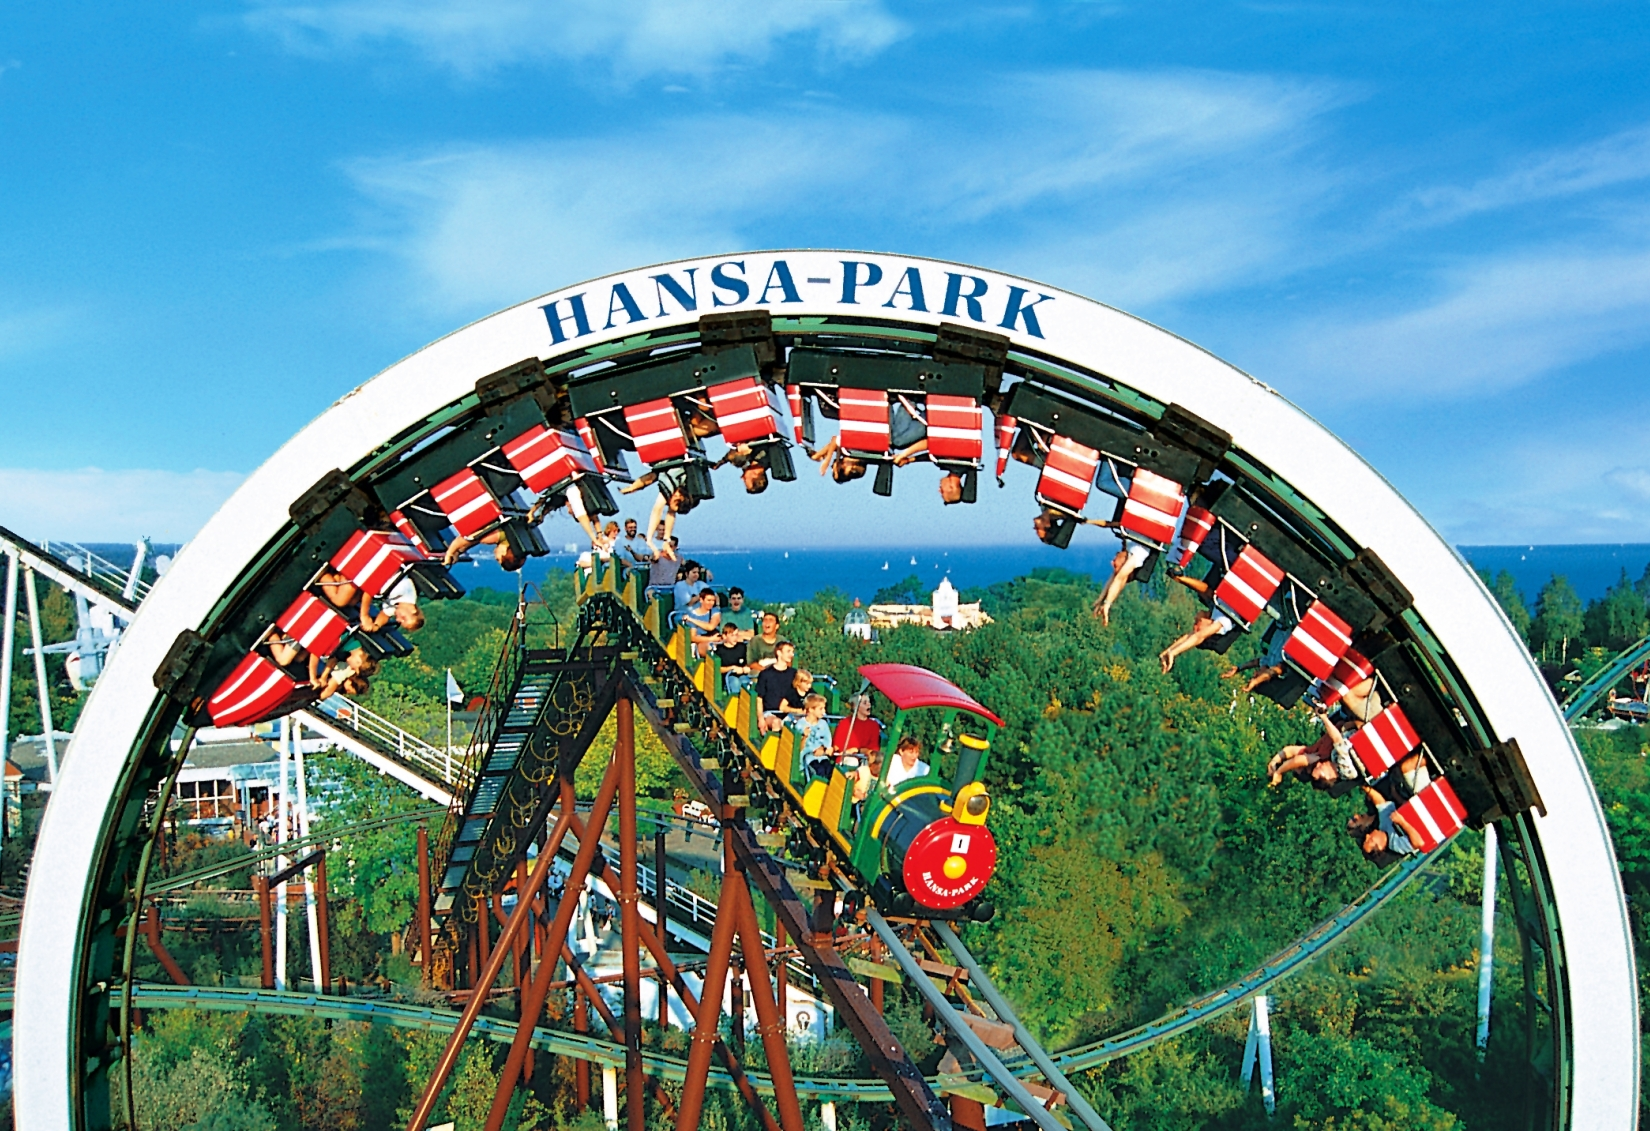 Hansa Park Nessie Looping 14pers